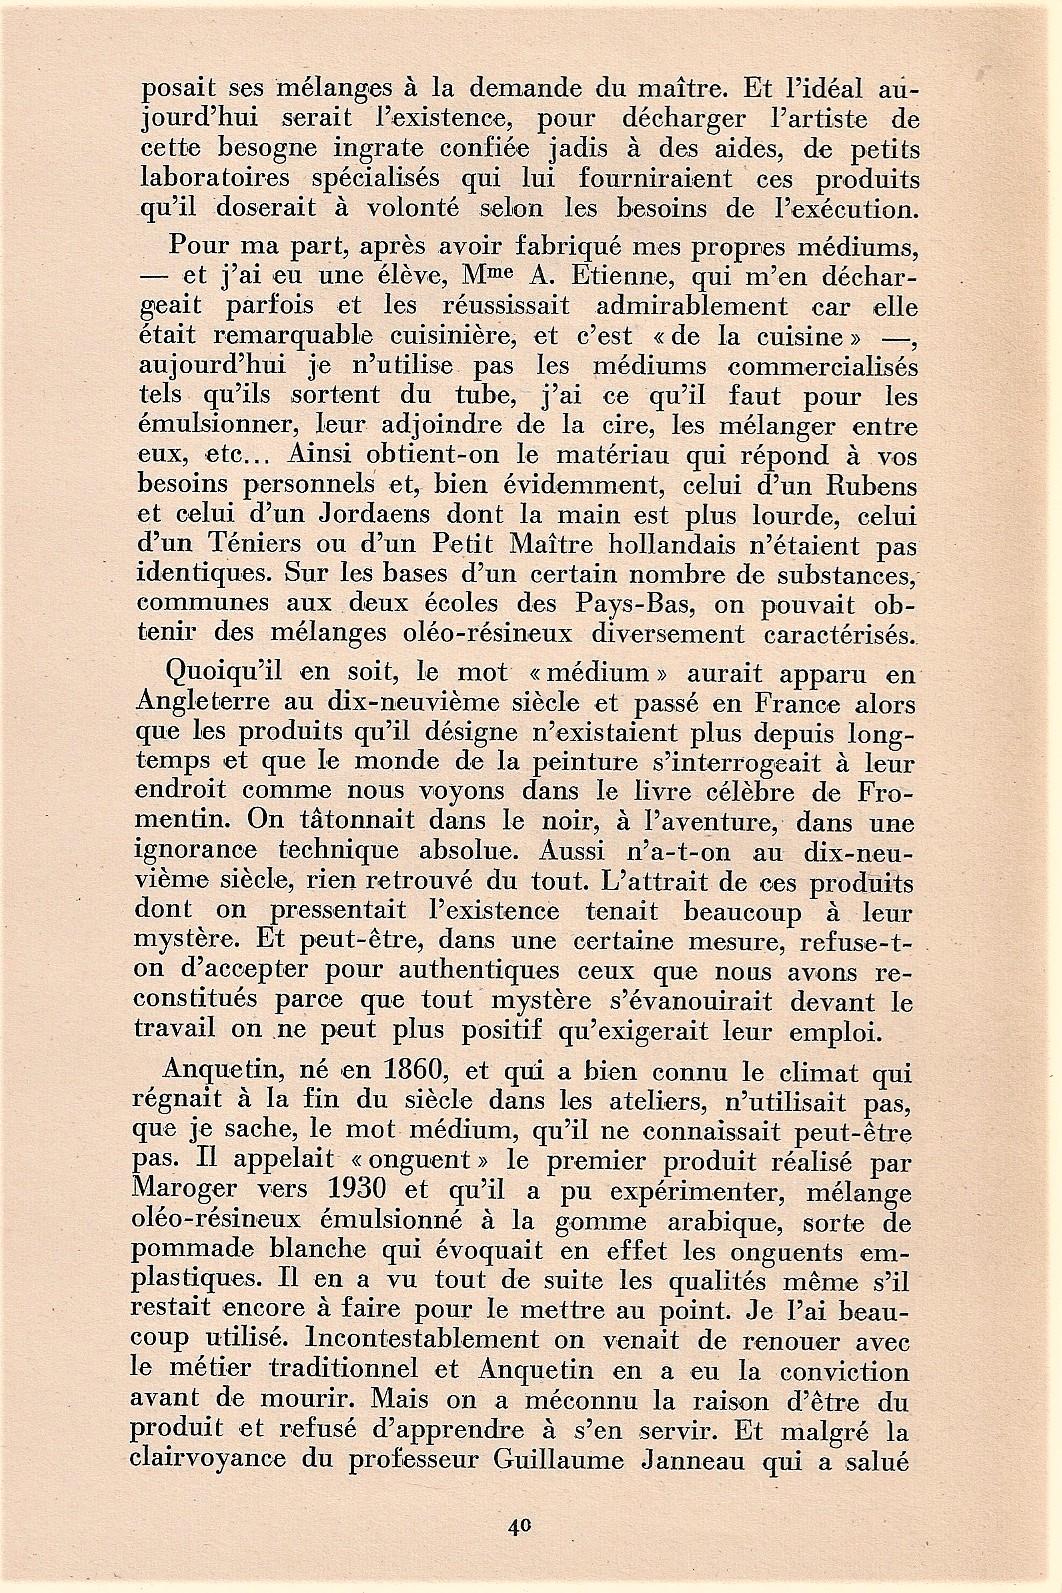 versini-page-40.jpg